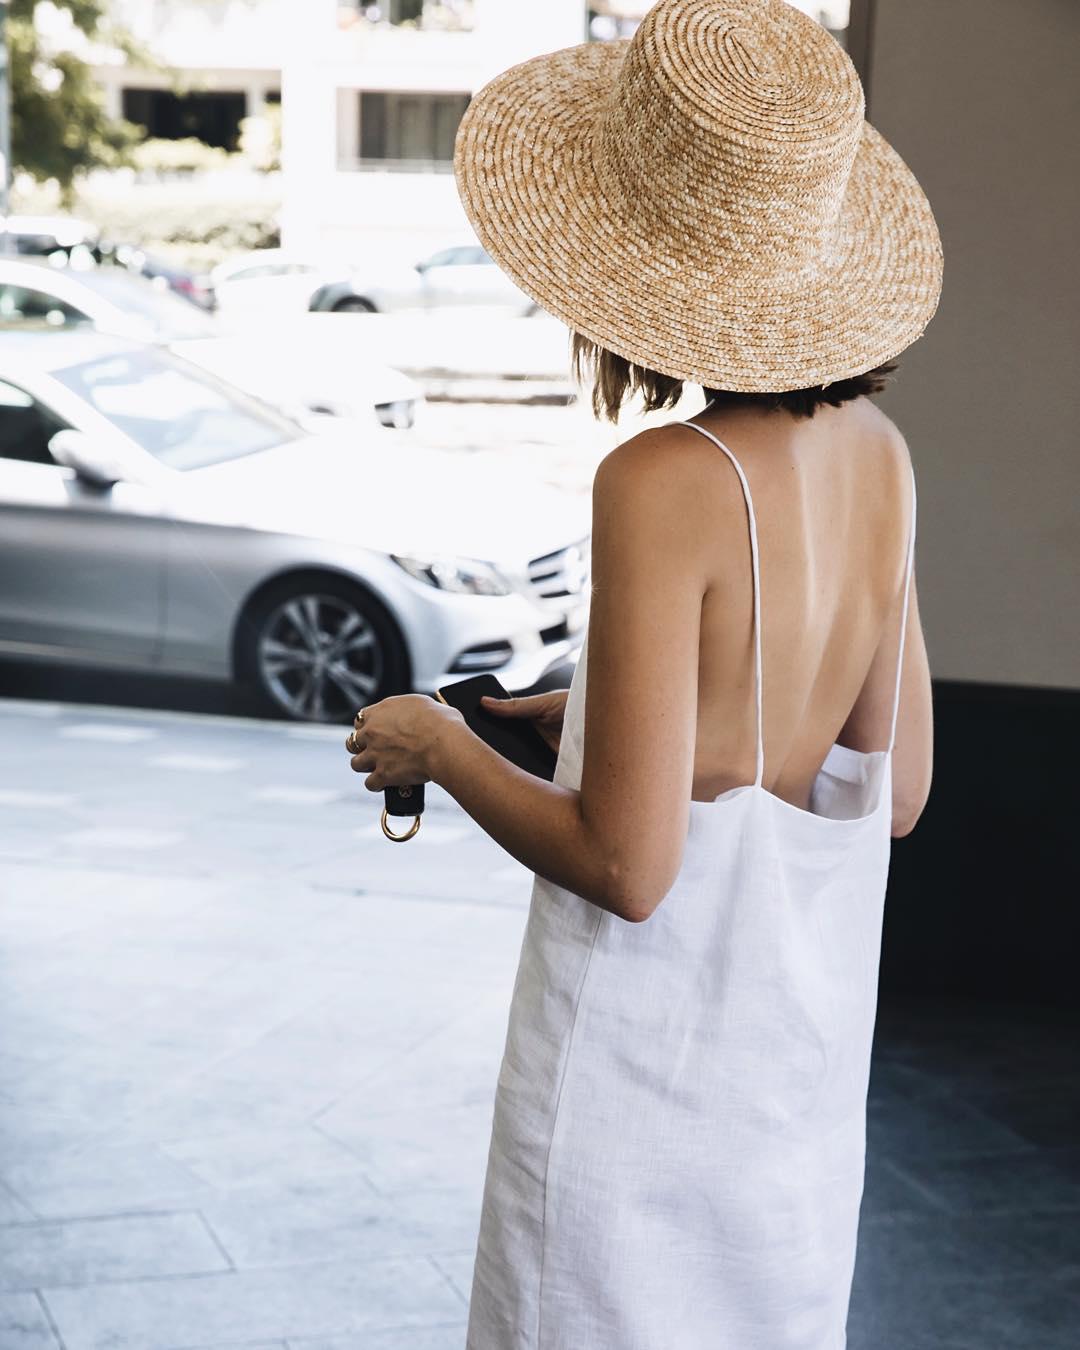 21 Breezy Sleeveless White Linen Dresses for Summer —Carmen Grace Hamilton Outfit Idea Minimalist Linen Dress and Straw Hat